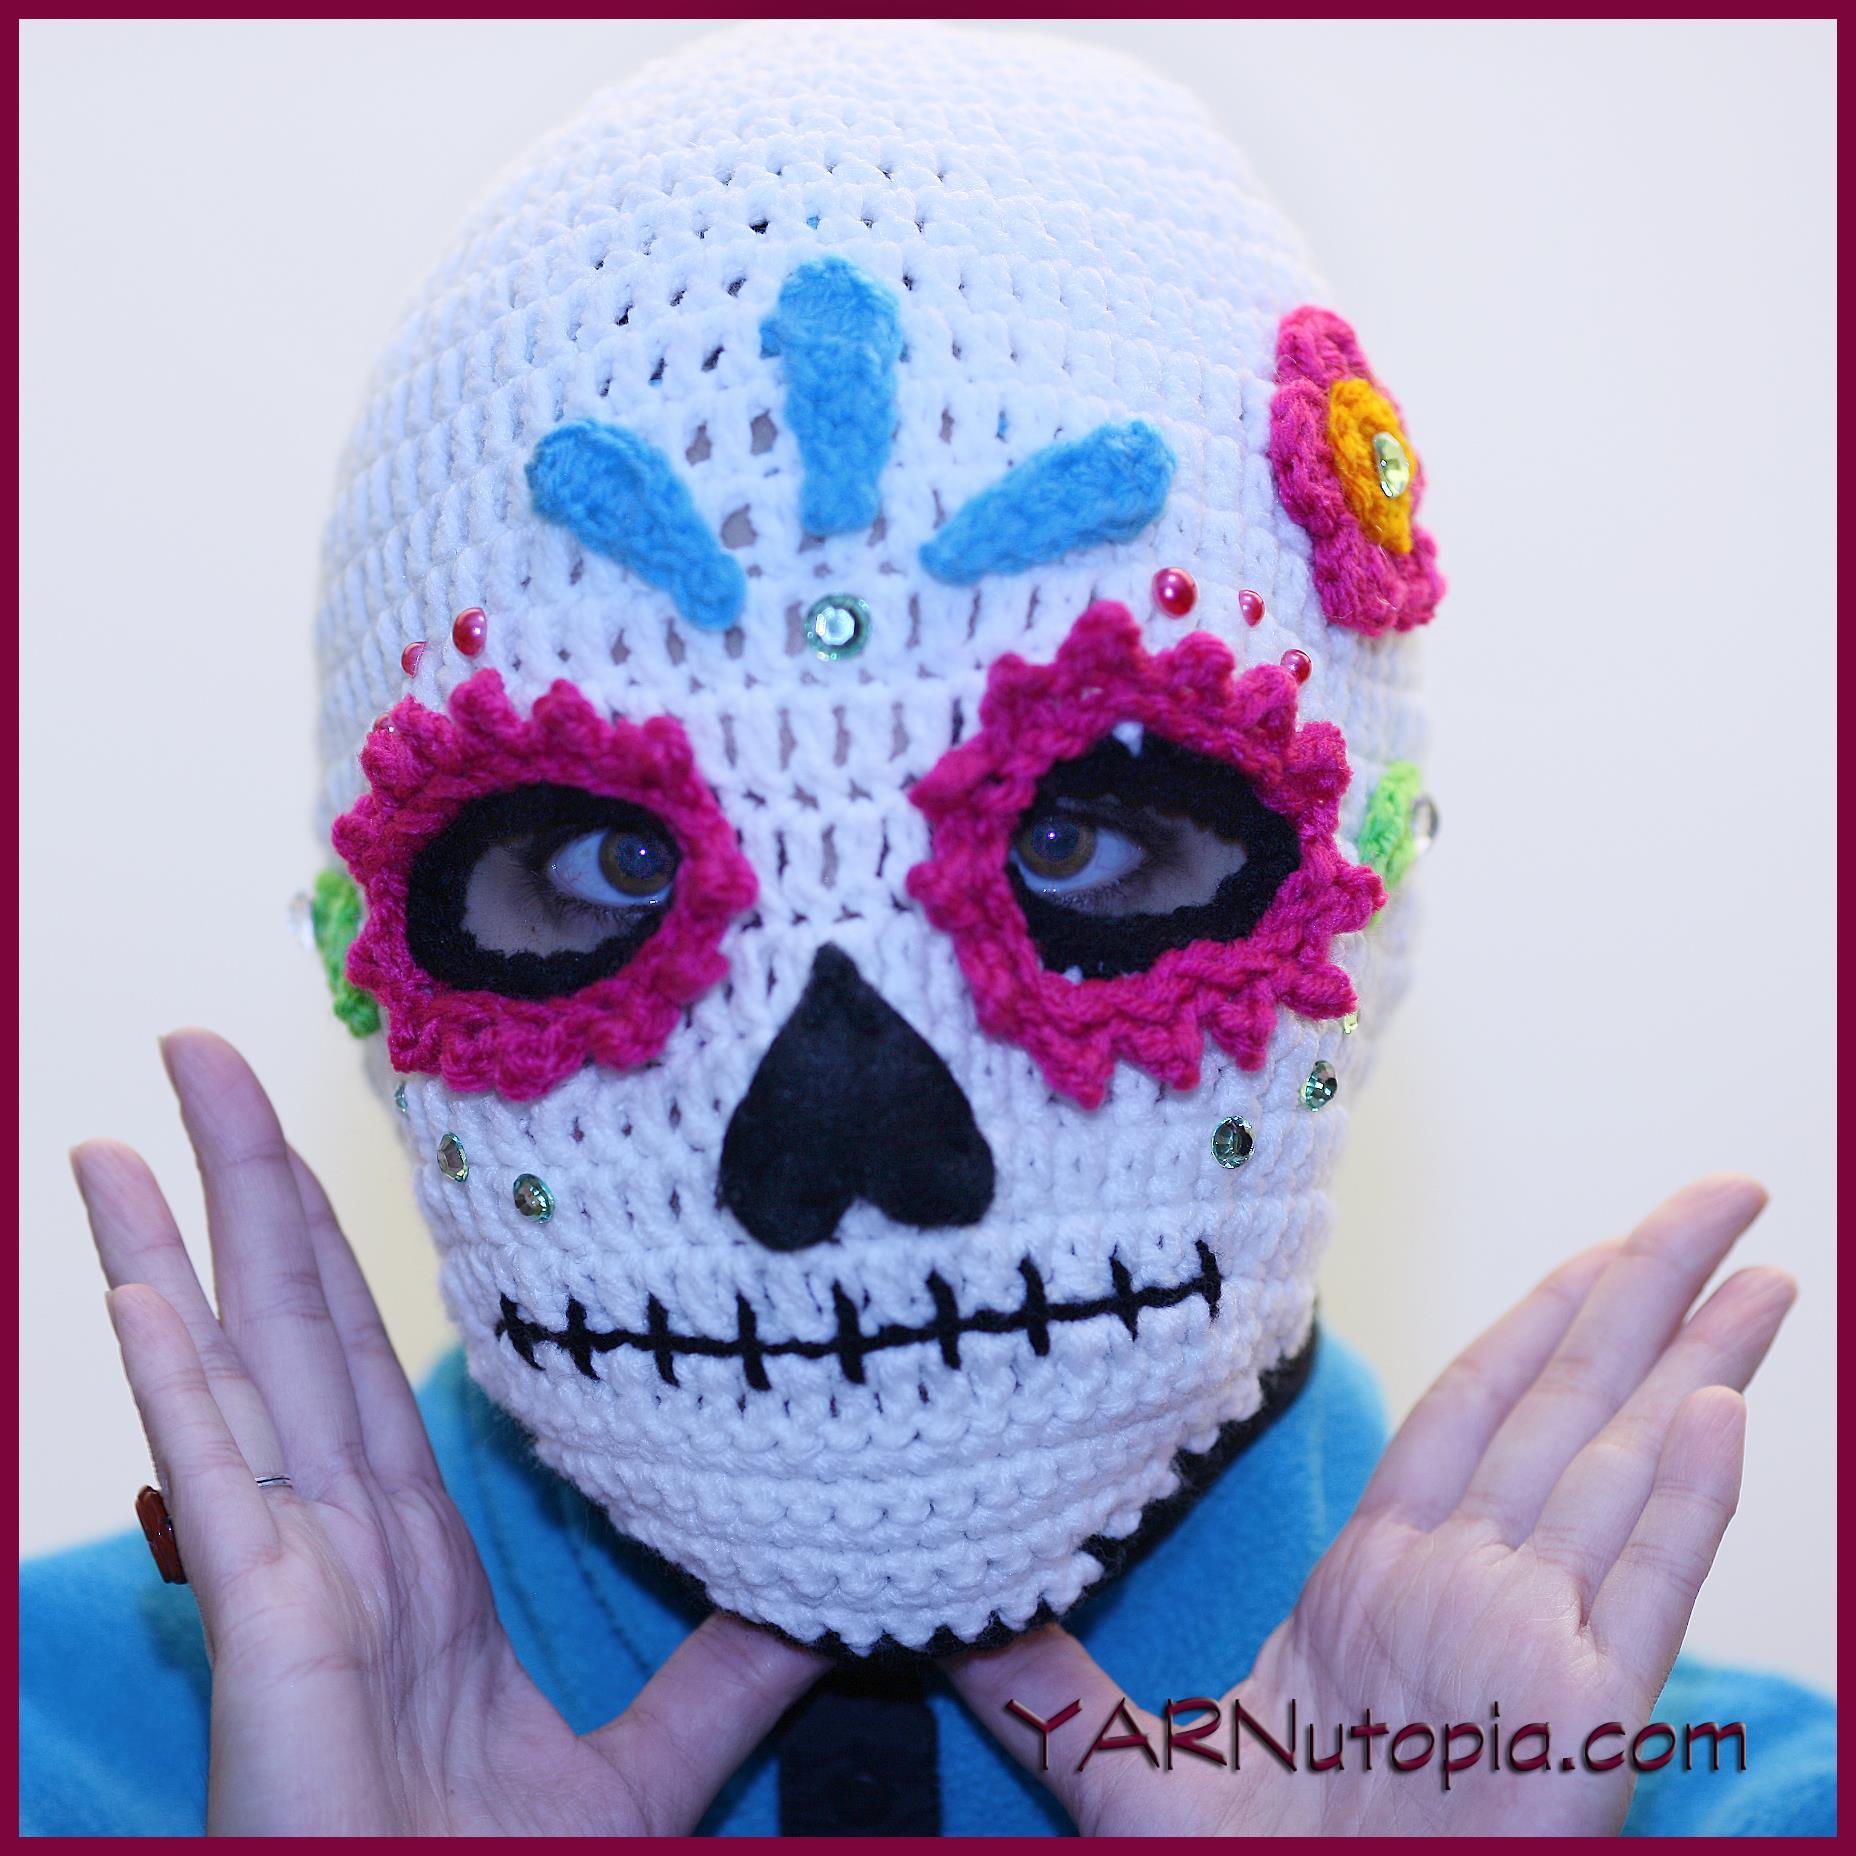 Crochet Tutorial Sugar Skull Ski Mask Yarnutopia By Nadia Fuad